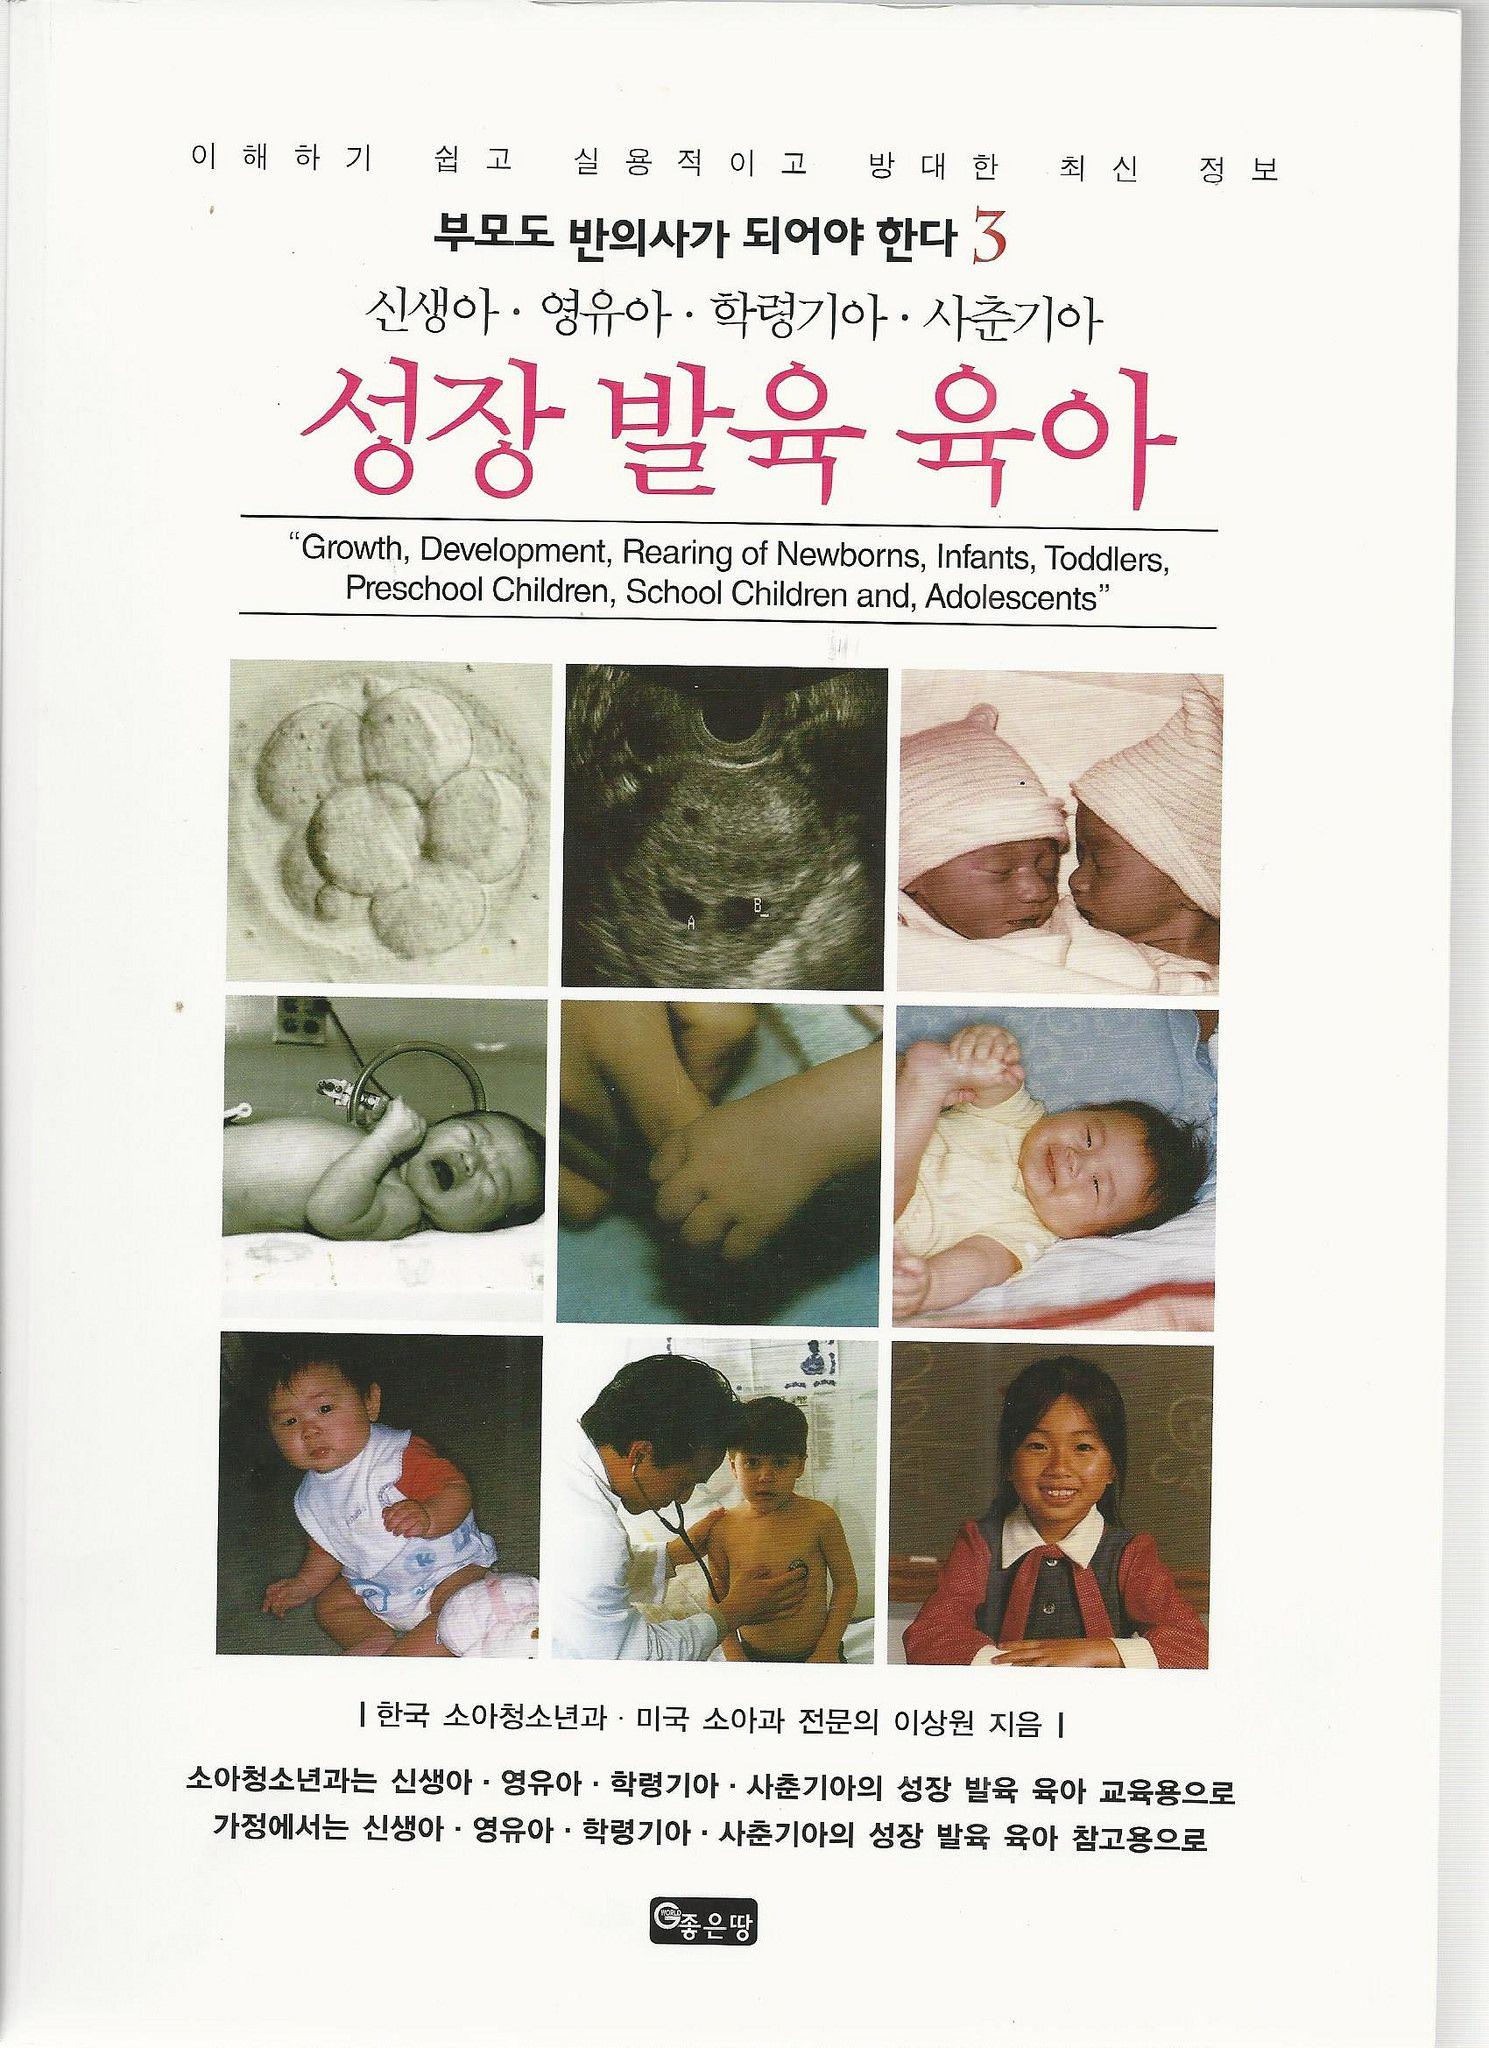 https://flic.kr/p/HDHCiG | 신생아 영유아 학령기아 사춘기아 성장 발육 육아 | 부모도 반의사가 되어야 한다 www.koreapediatrics.com